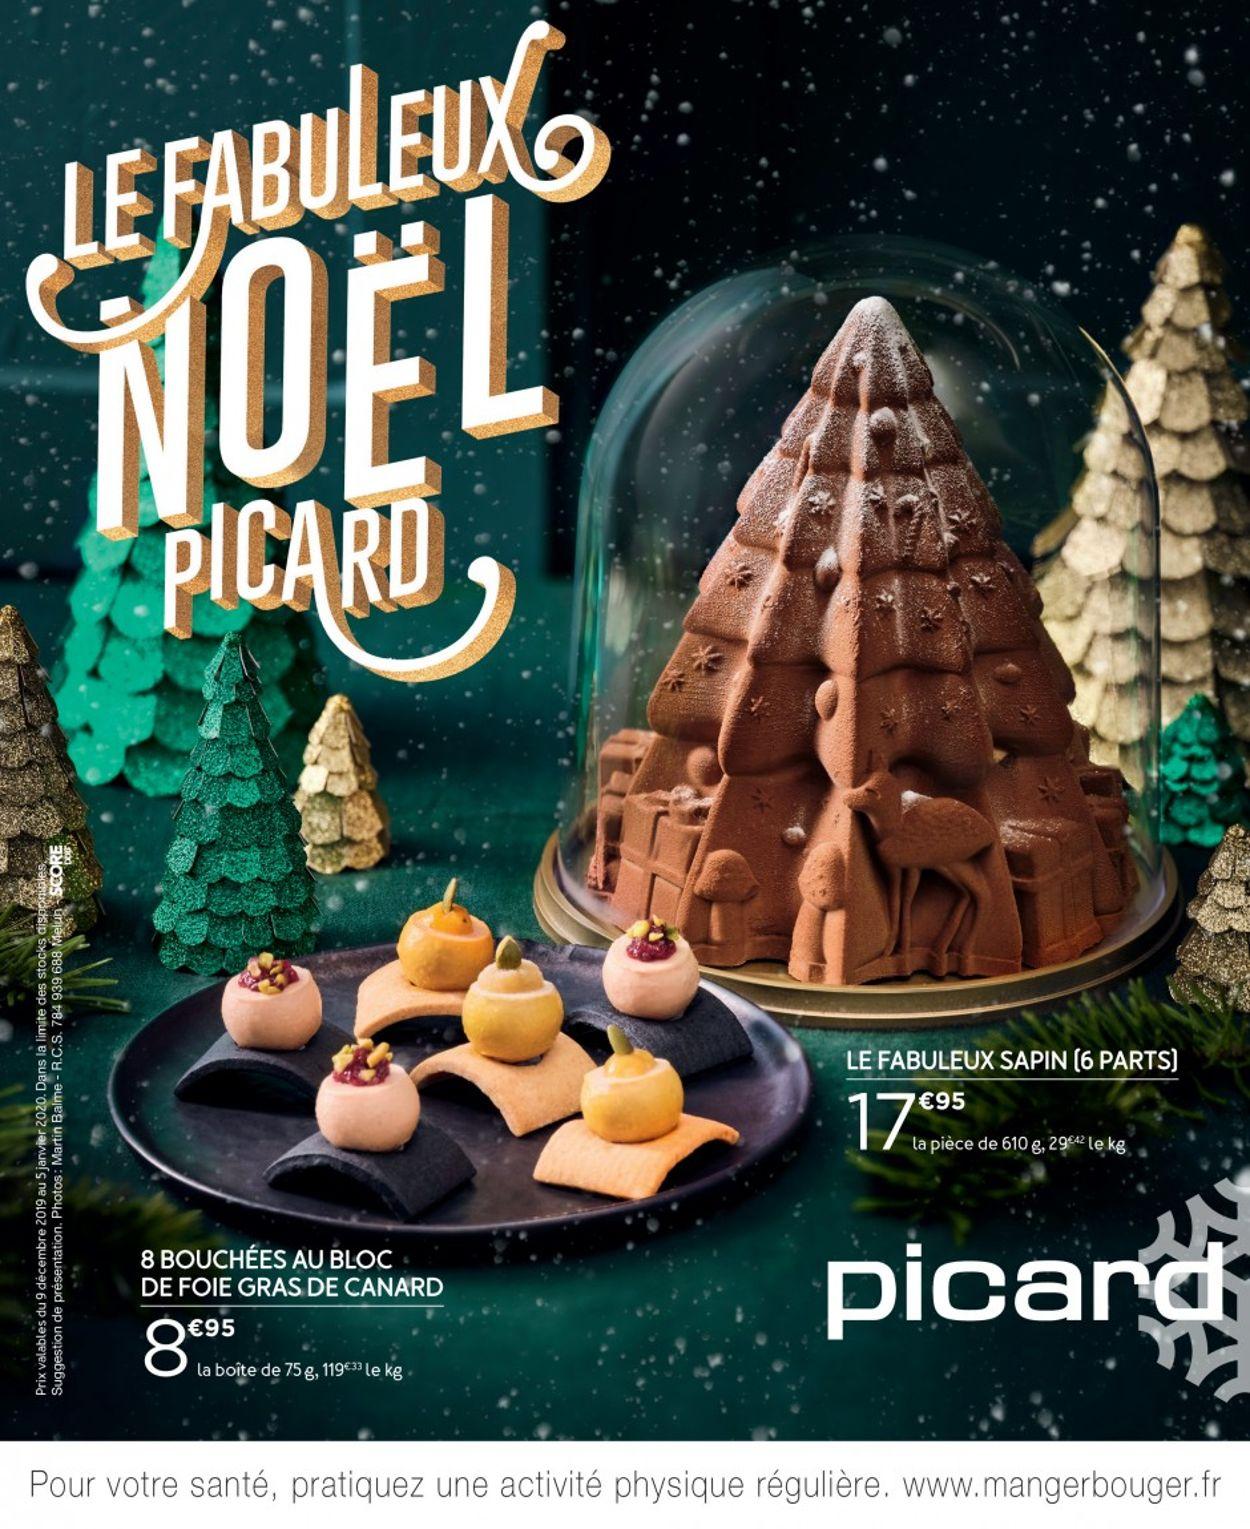 Picard catalogue de Noël 2019 Catalogue - 09.12-05.01.2020